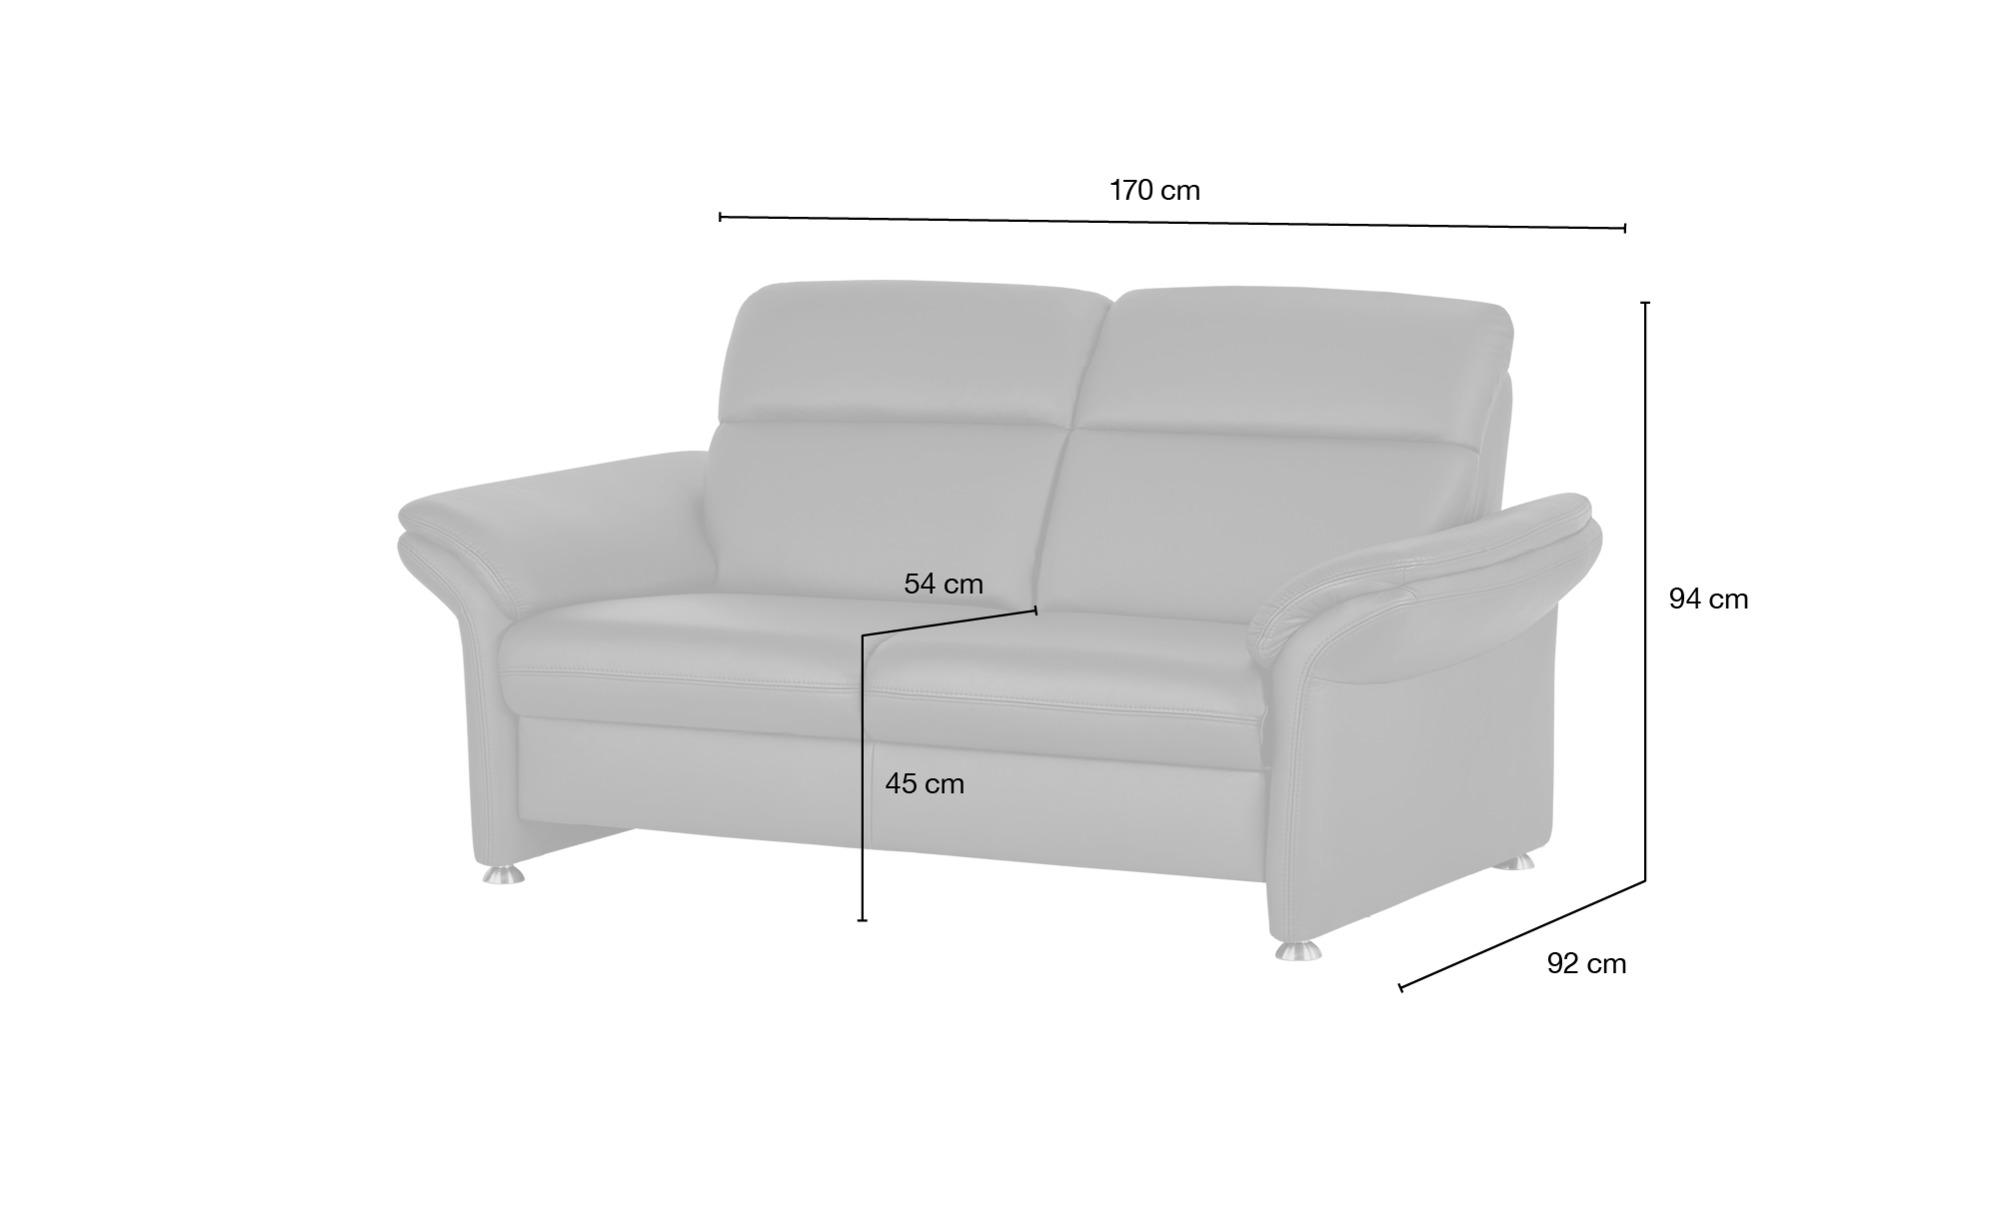 meinSofa Ledersofa dunkelrot - Leder Manon ¦ lila/violett ¦ Maße (cm): B: 170 H: 94 T: 92 Polstermöbel > Sofas > 2-Sitzer - Höffner